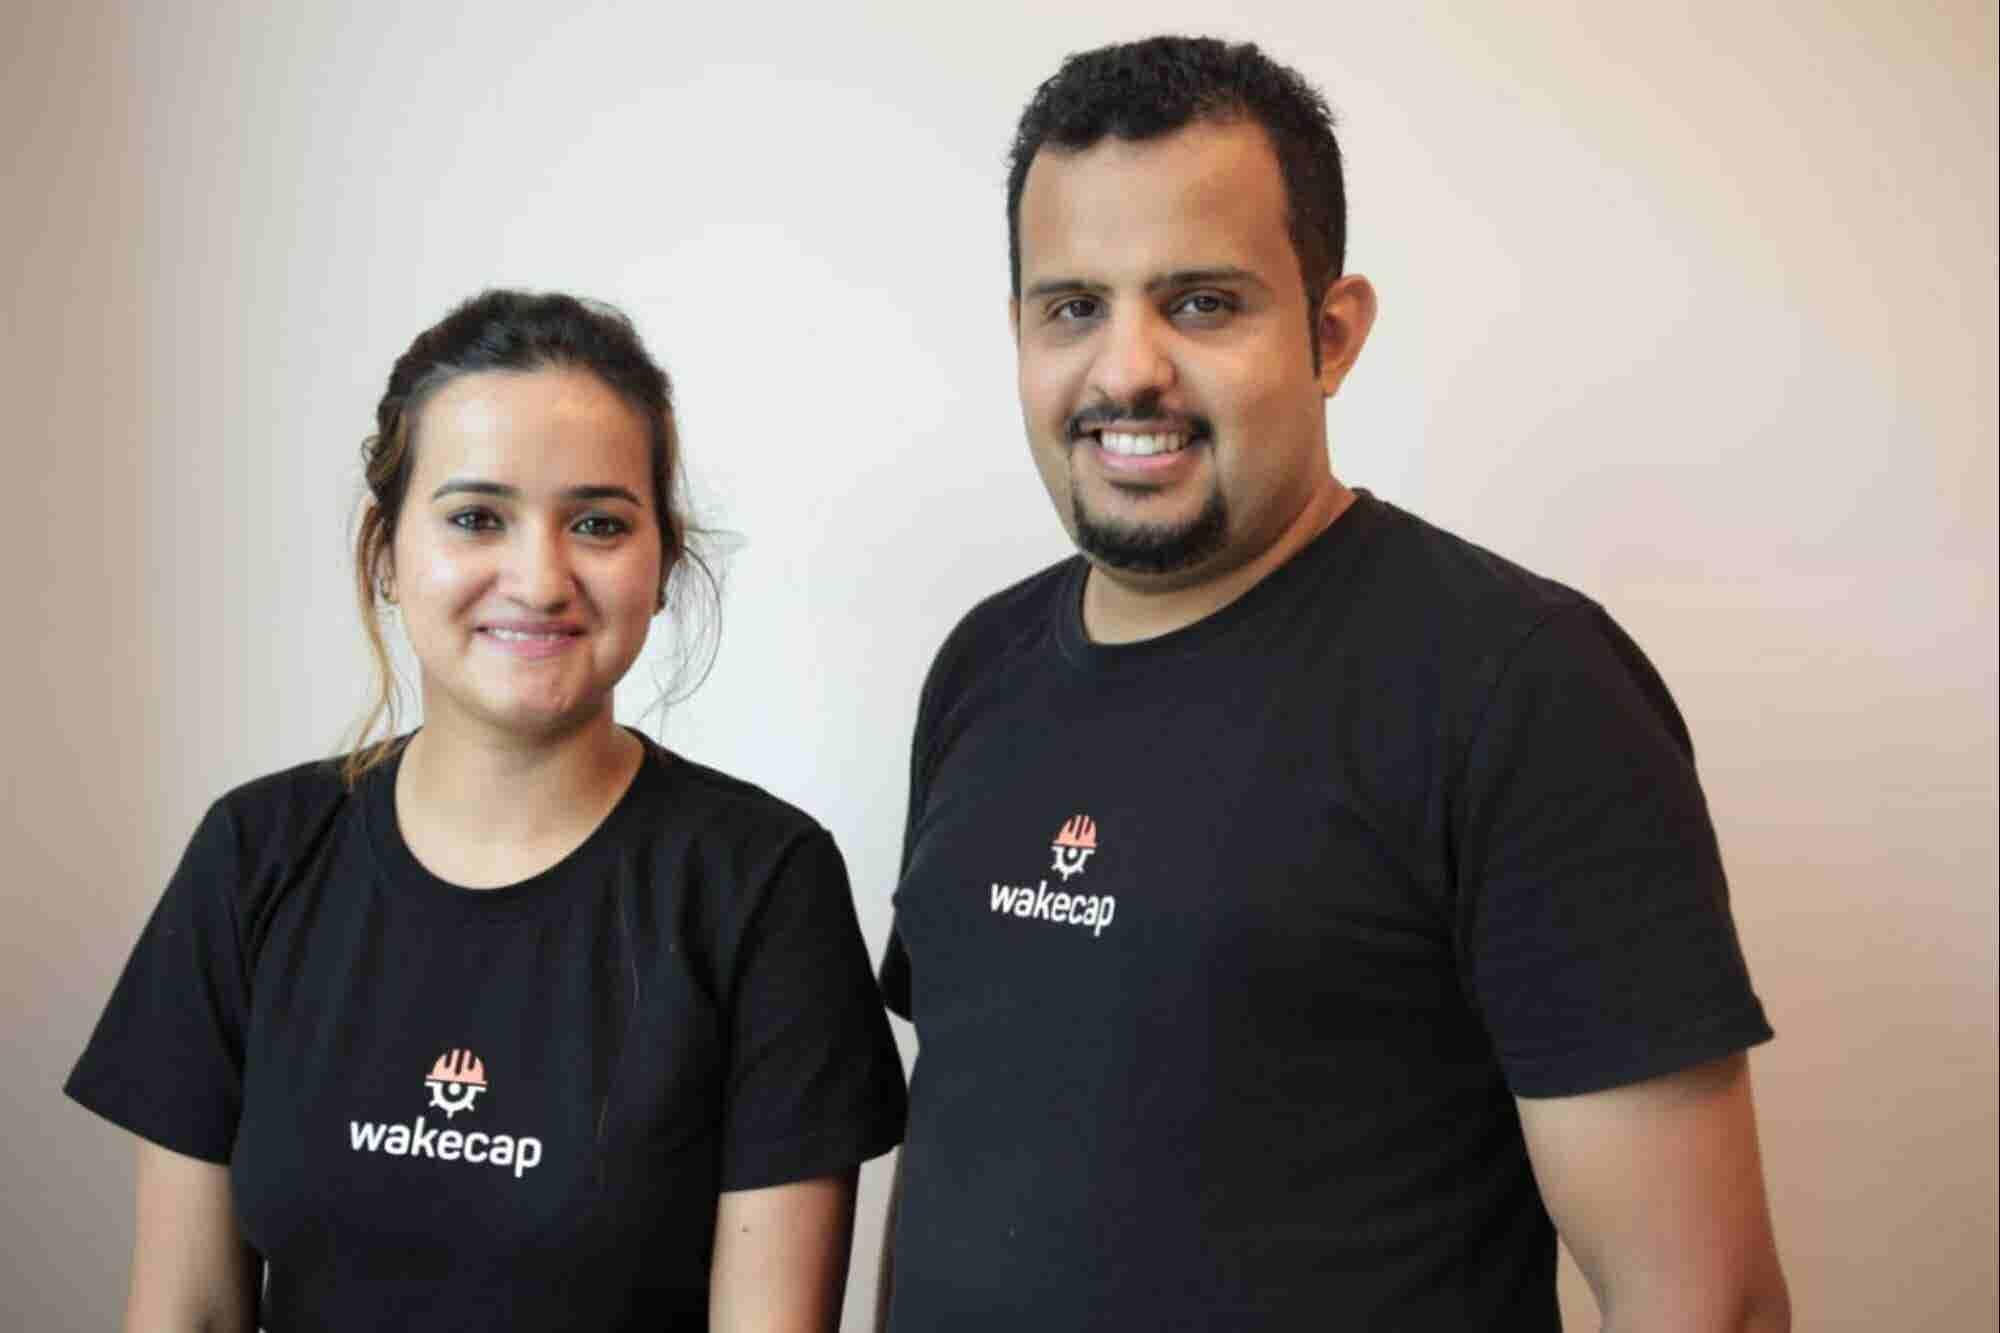 Better Together: Co-Founders Of Dubai-Based Startup WakeCap Hassan Albalawi And Ishita Sood Talk Partnership Pros